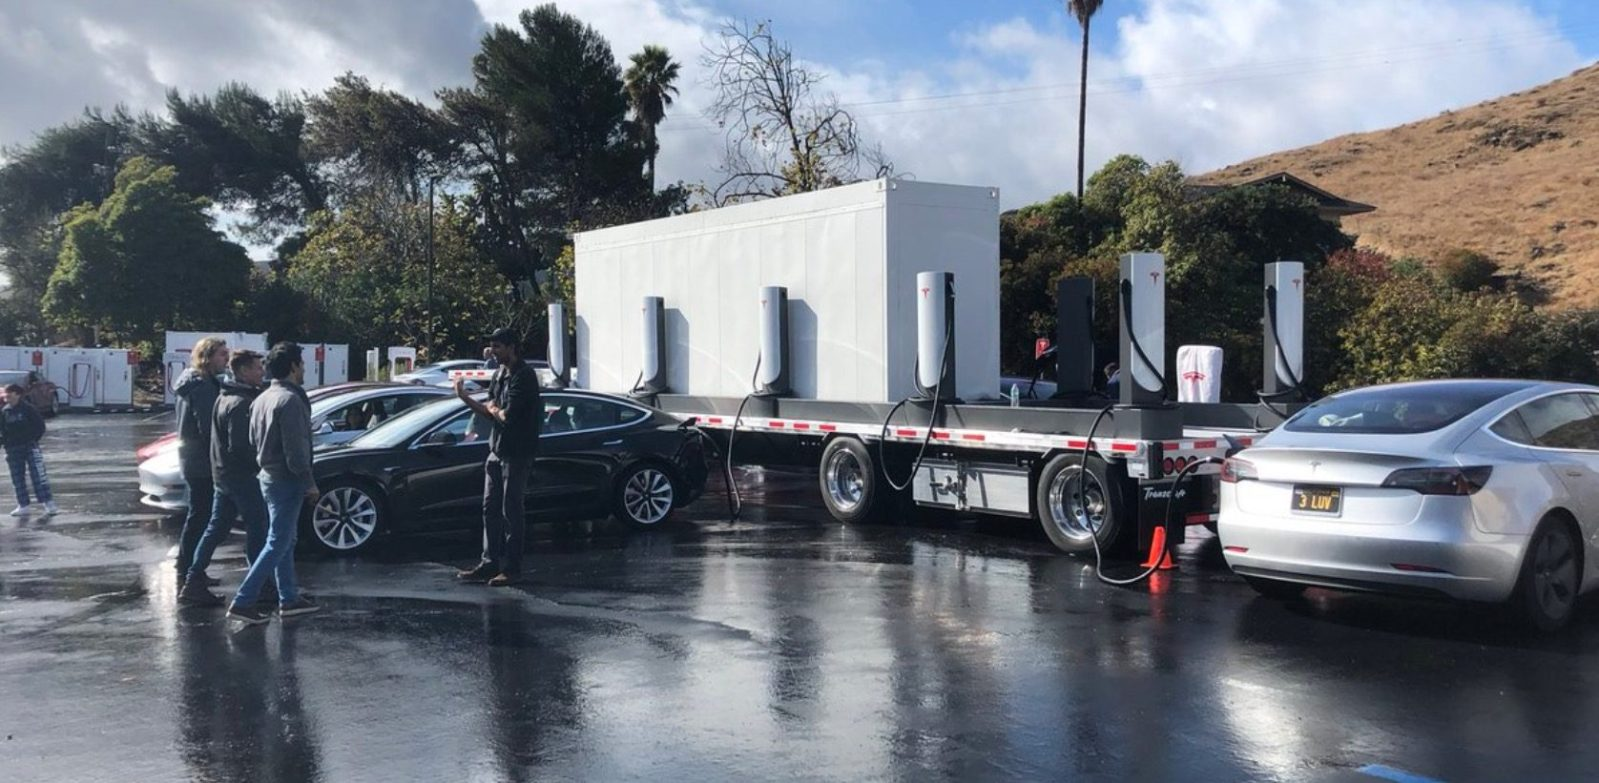 Tesla deploys new mobile Supercharger powered by Megapack instead of diesel generators